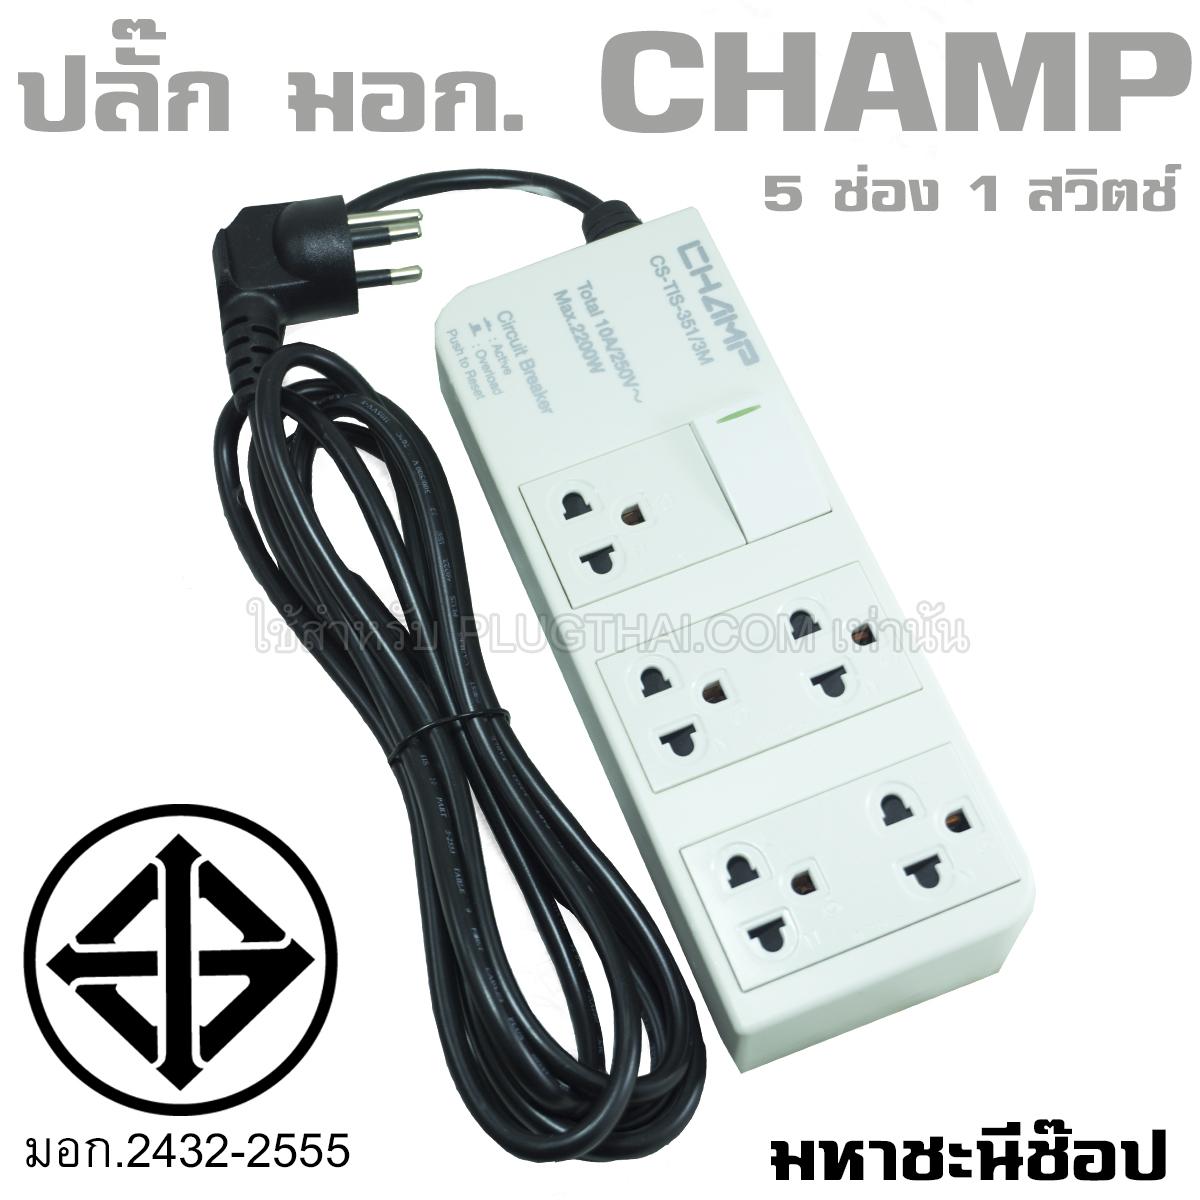 (PRO)ปลั๊กไฟ CHAMP TIS 5 ช่อง 1 สวิตช์ 10A (2432-2555)